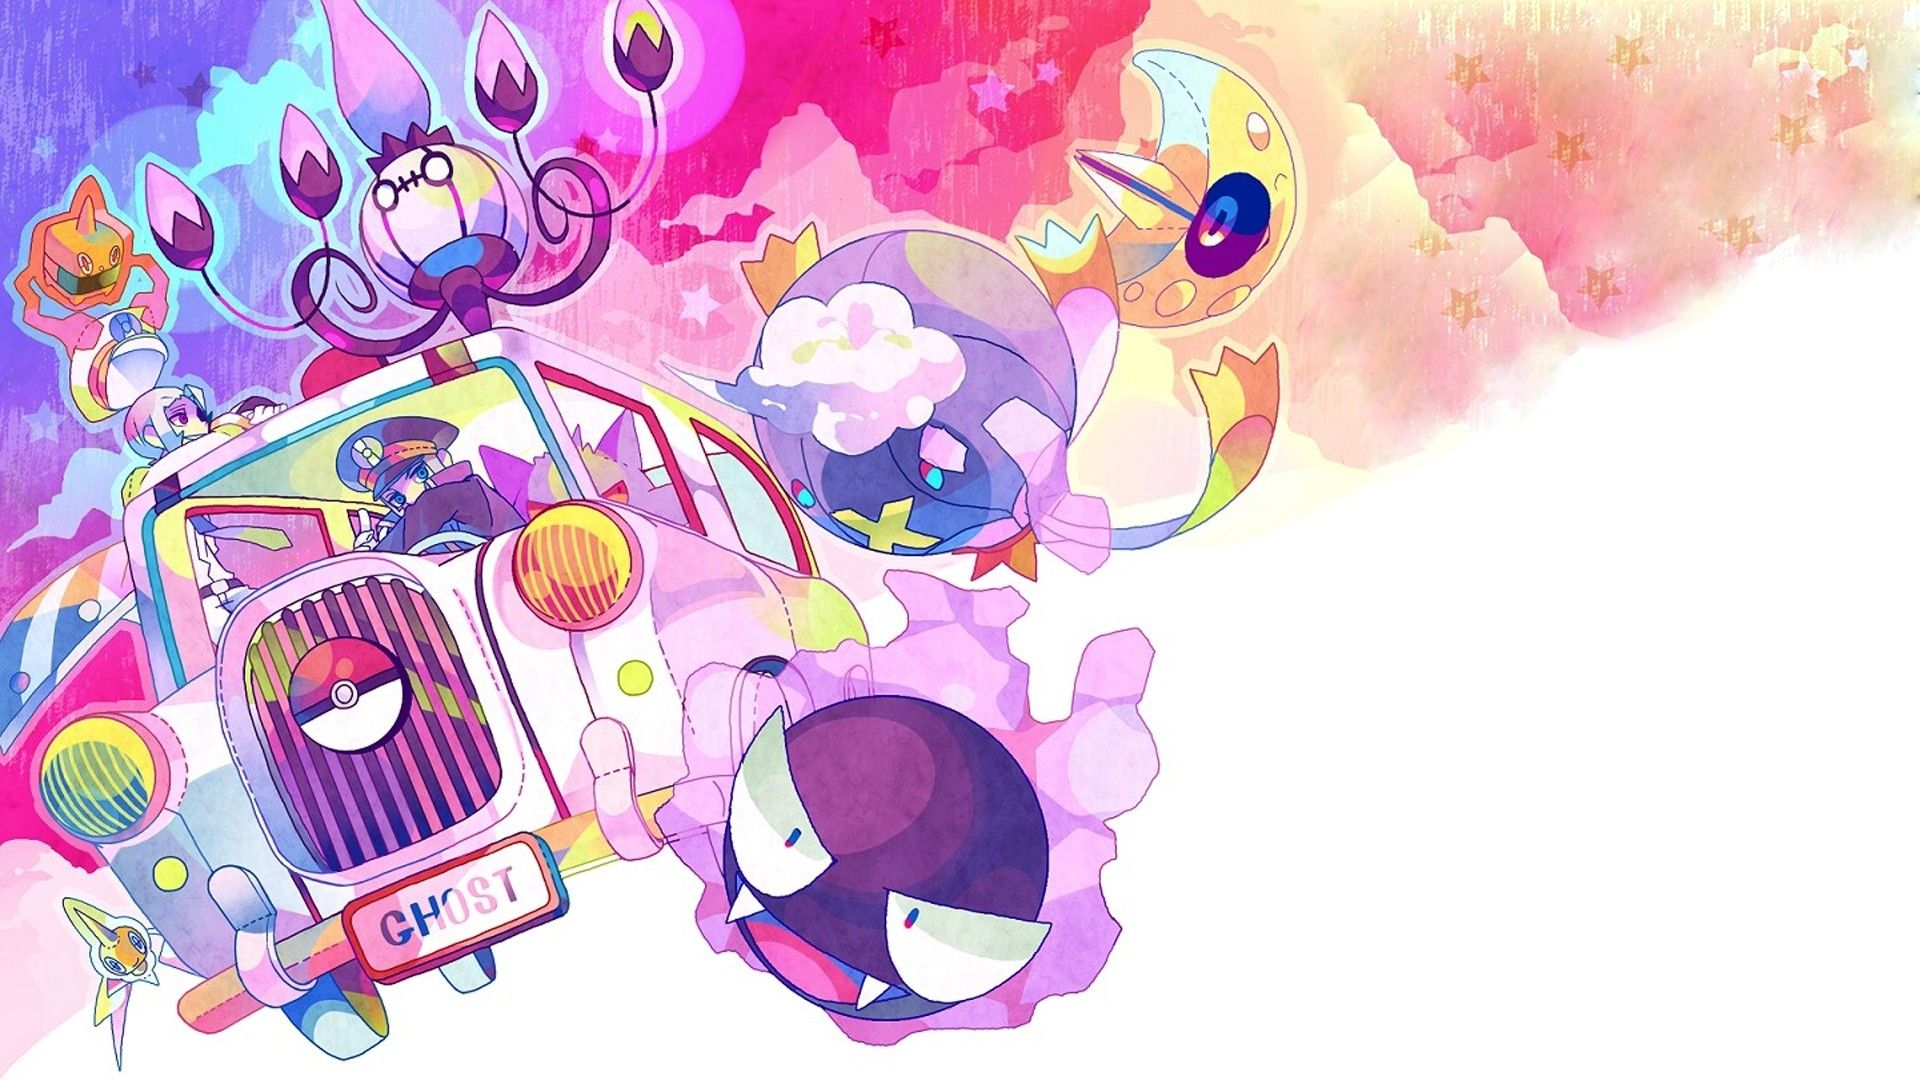 Psychic Type Pokemon Wallpapers Wallpaper Cave